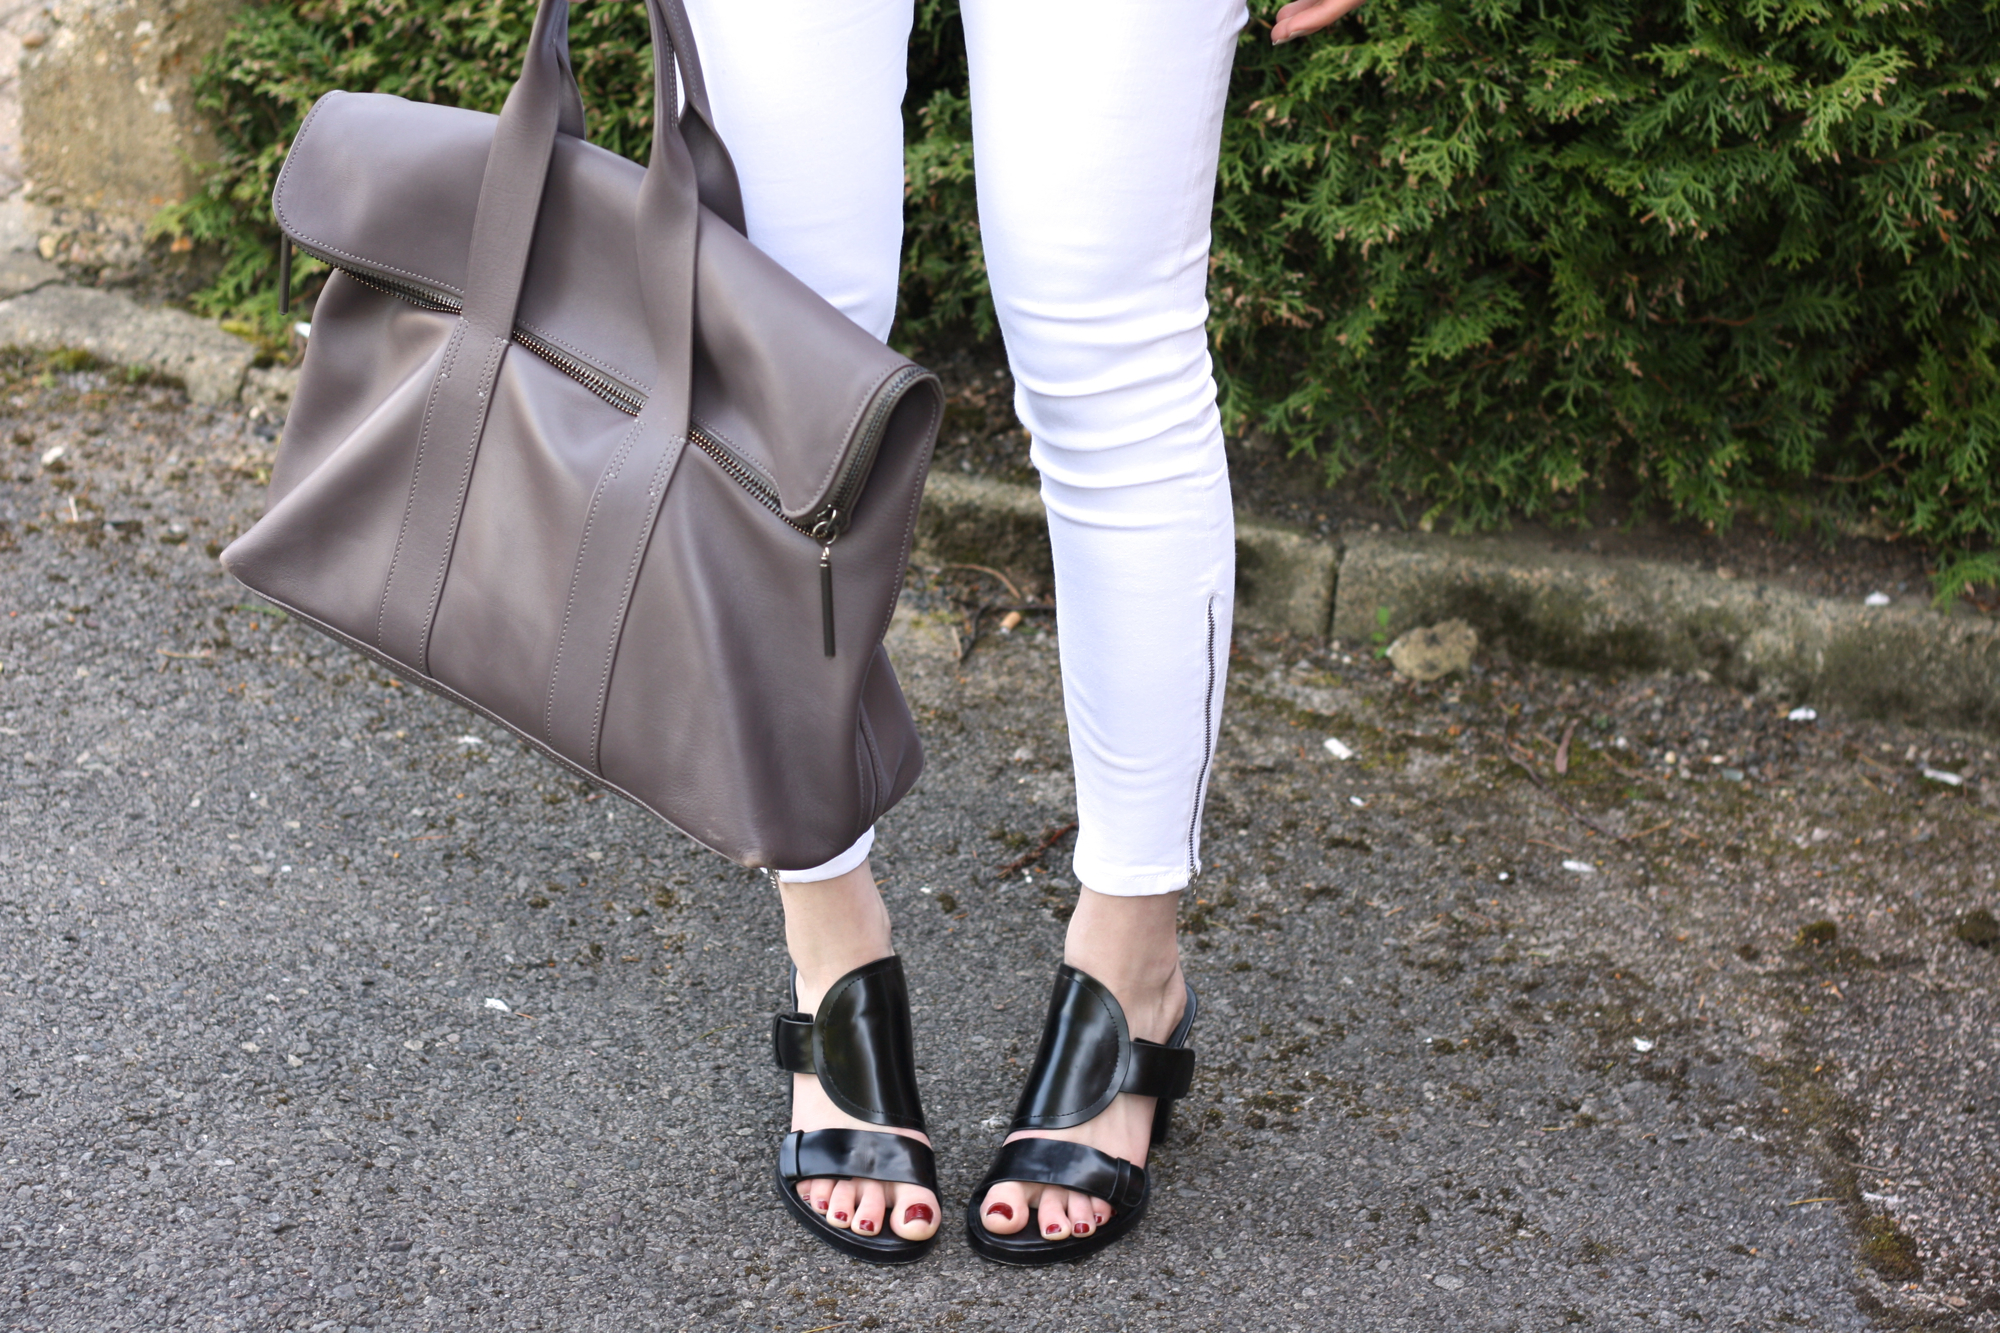 & Other Stories black heeled sandals